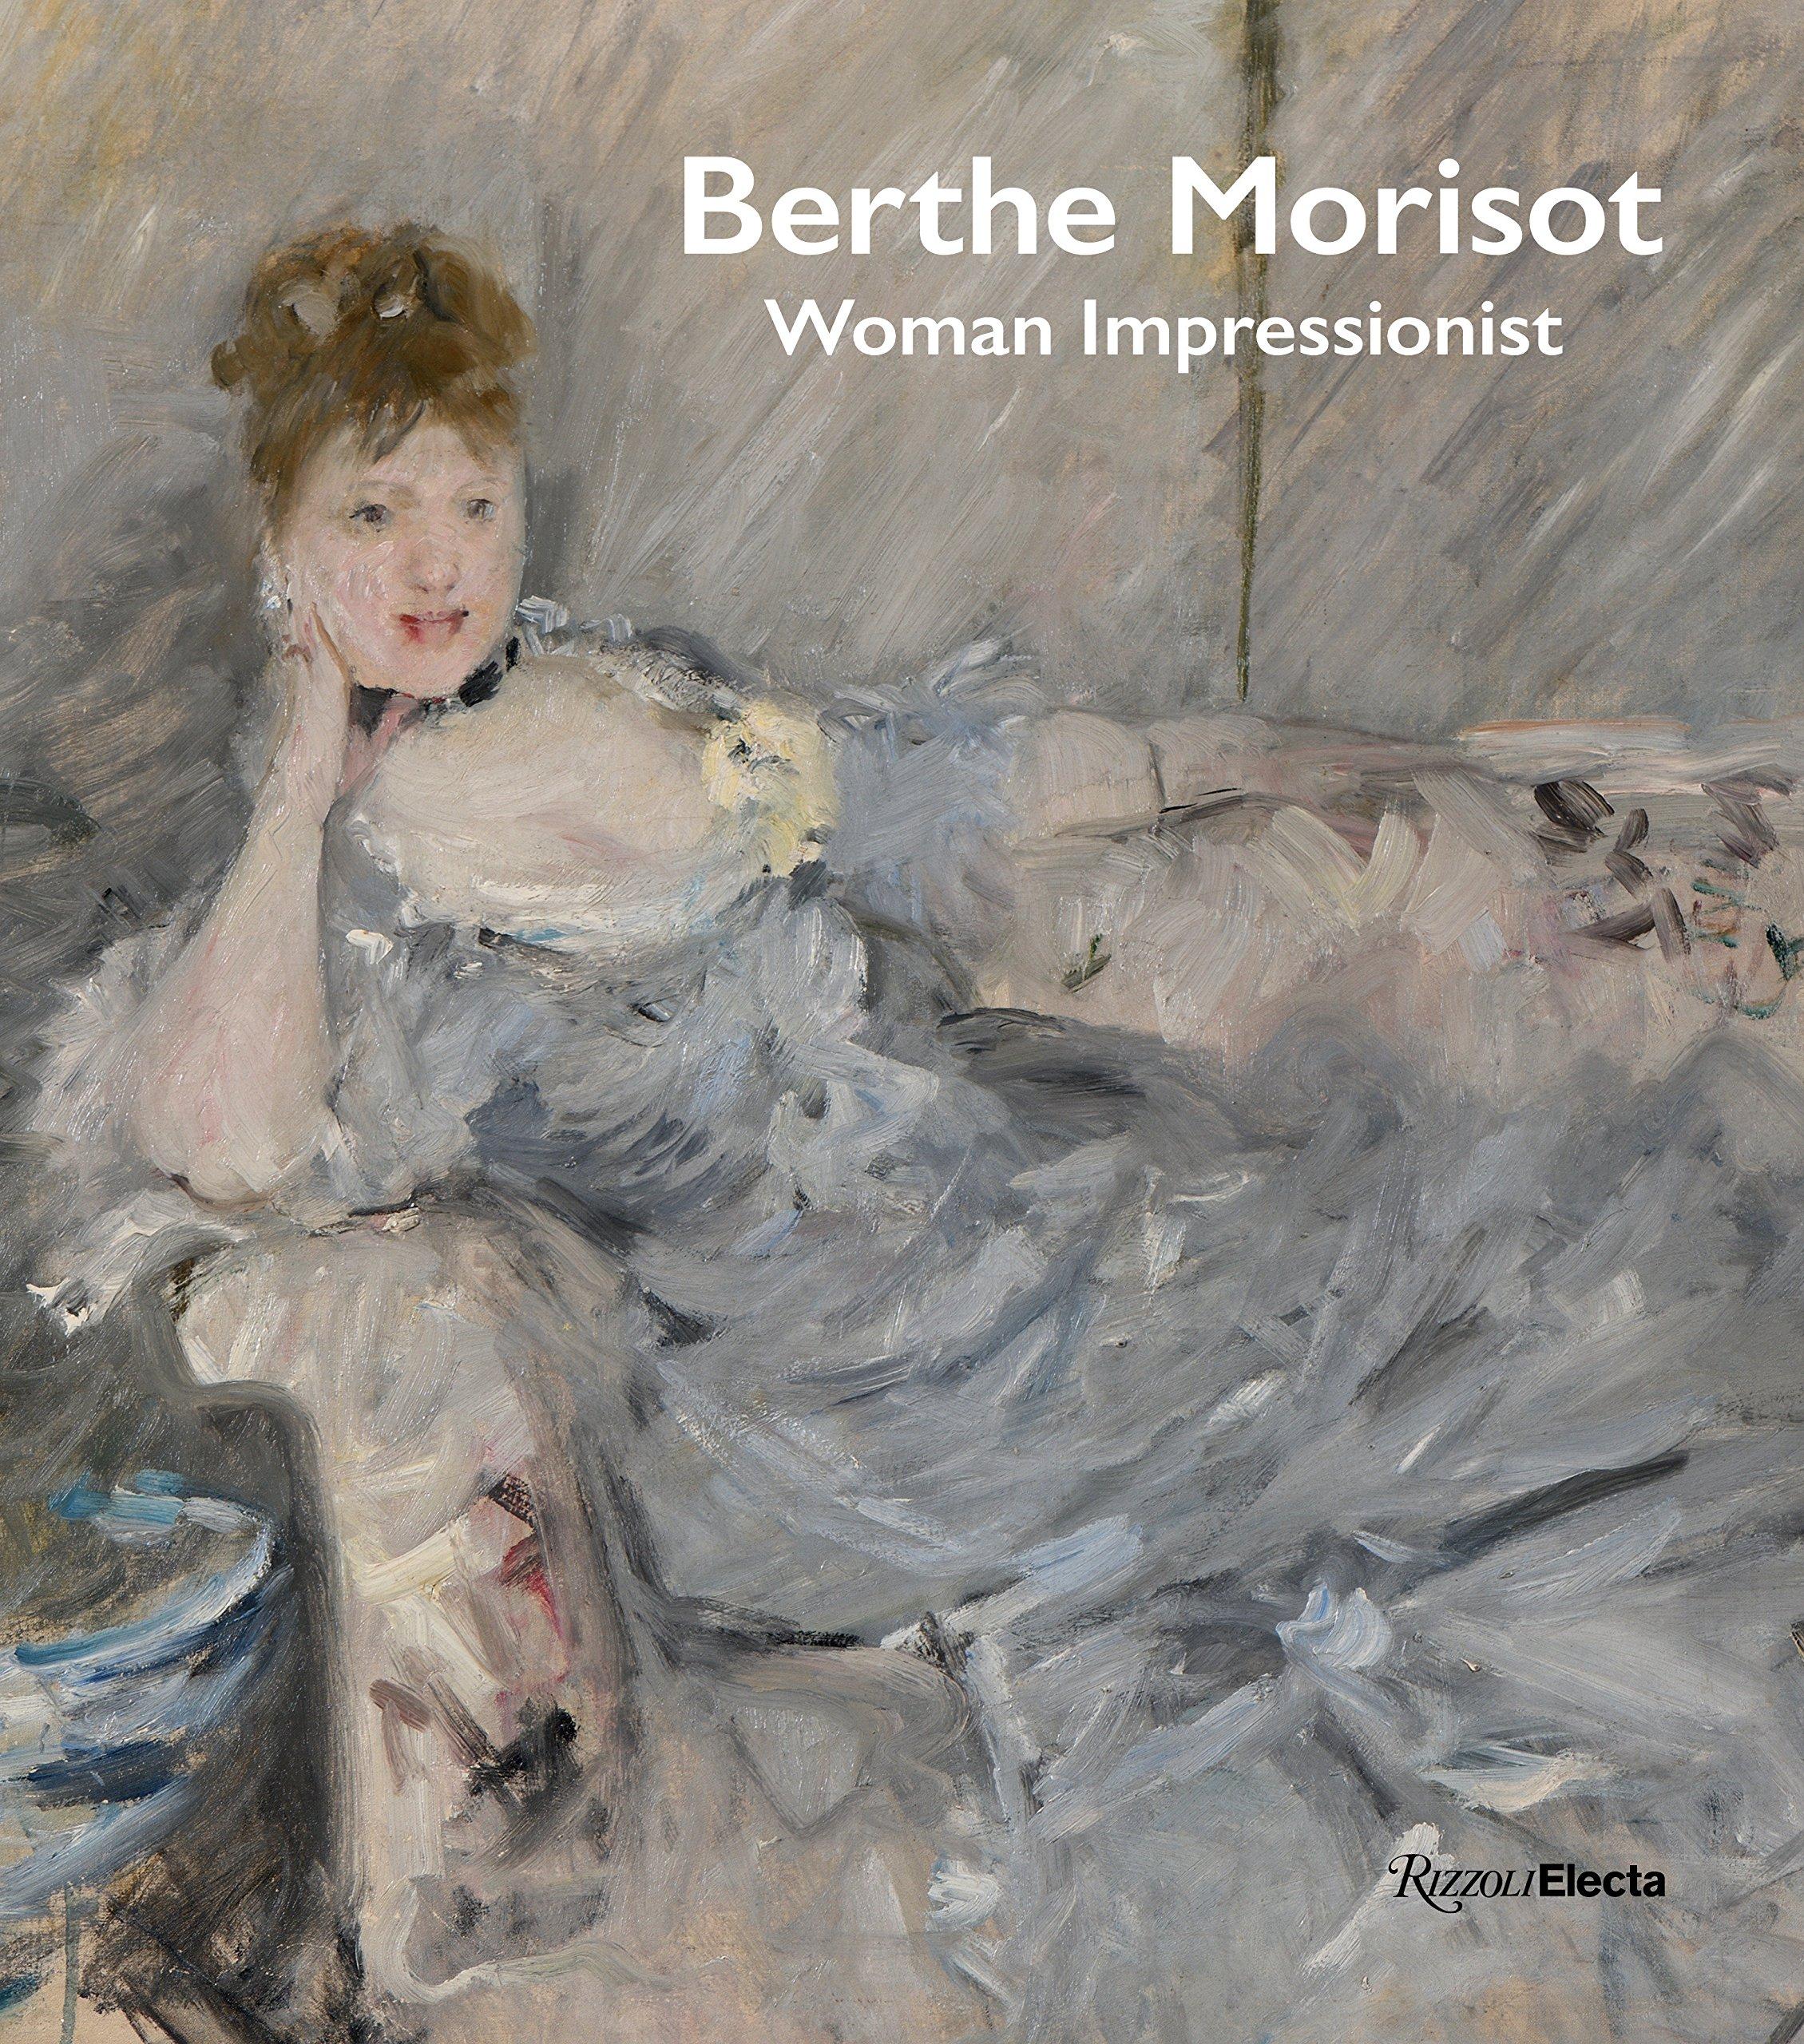 Berthe Morisot, Woman Impressionist by Rizzoli Electa